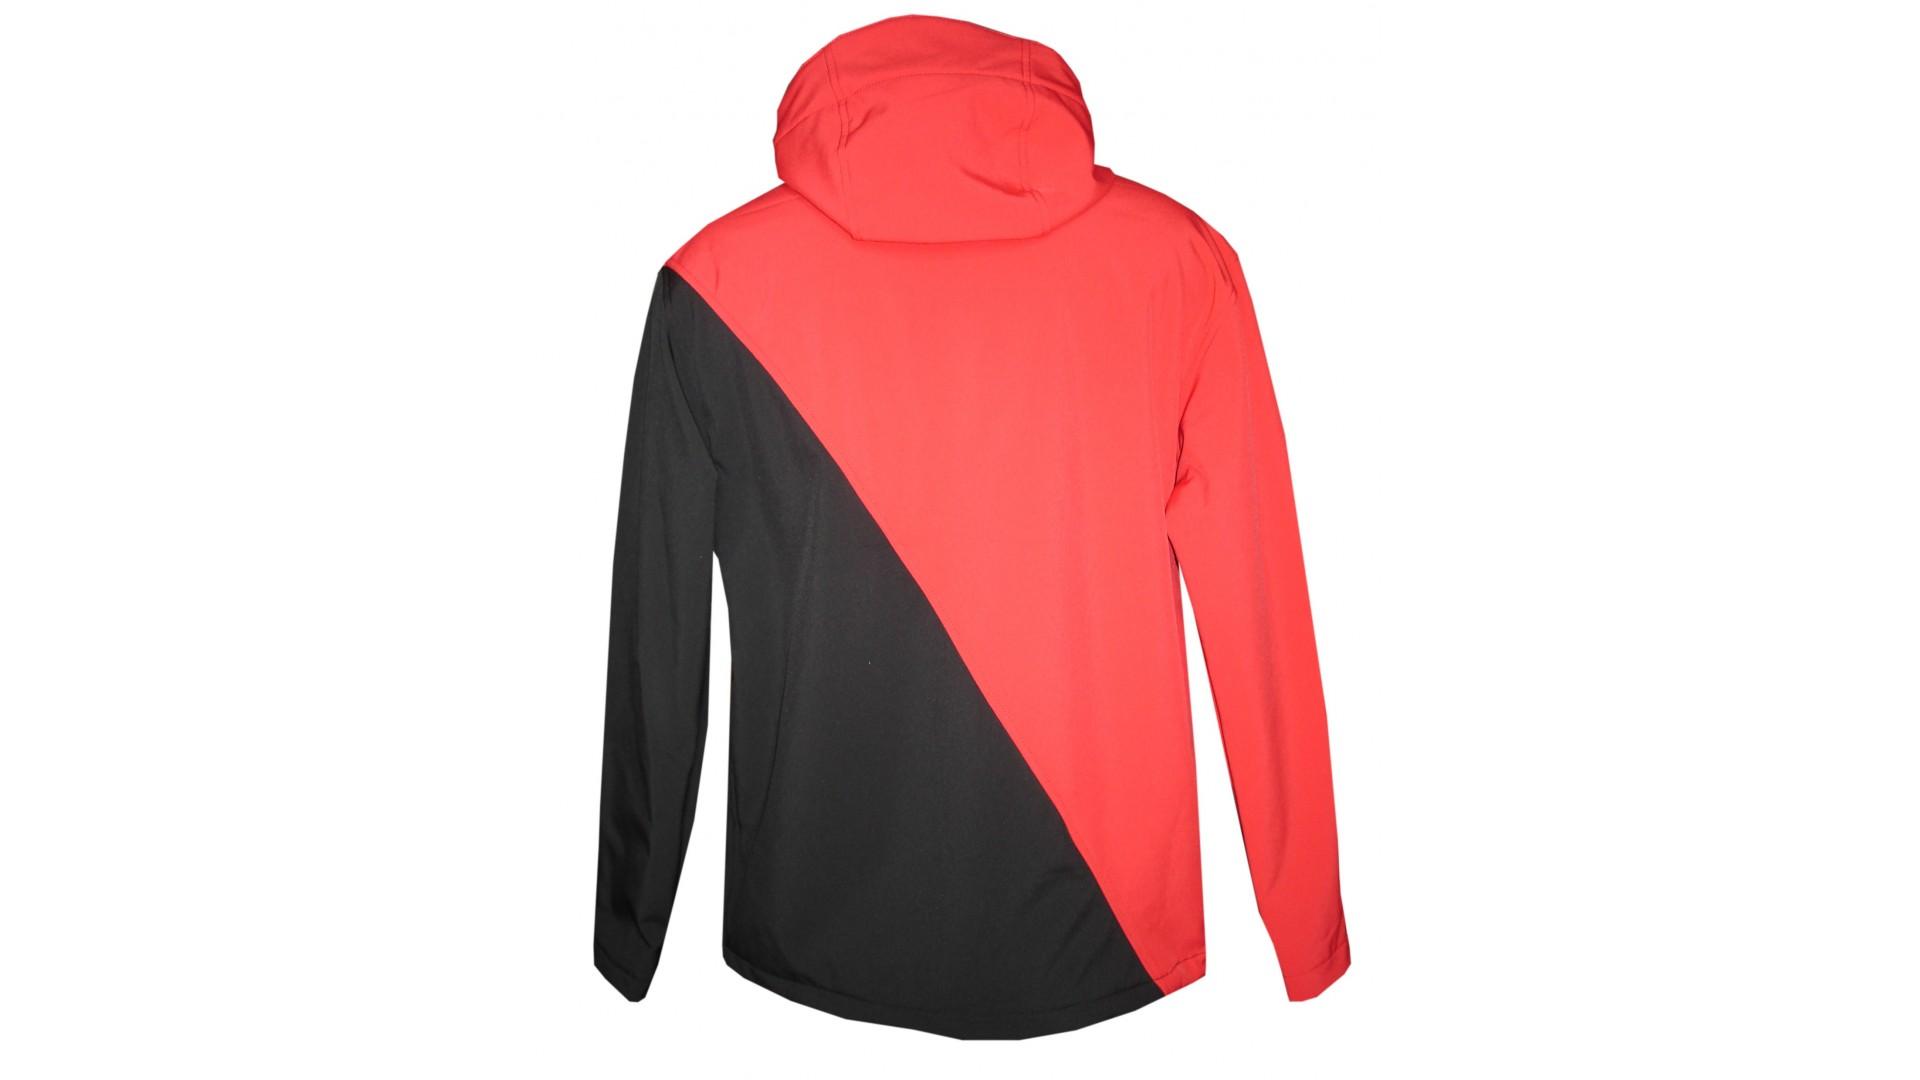 елокуртка Ghost с капюшоном мужская red/black/blue год 2015 вид сзади